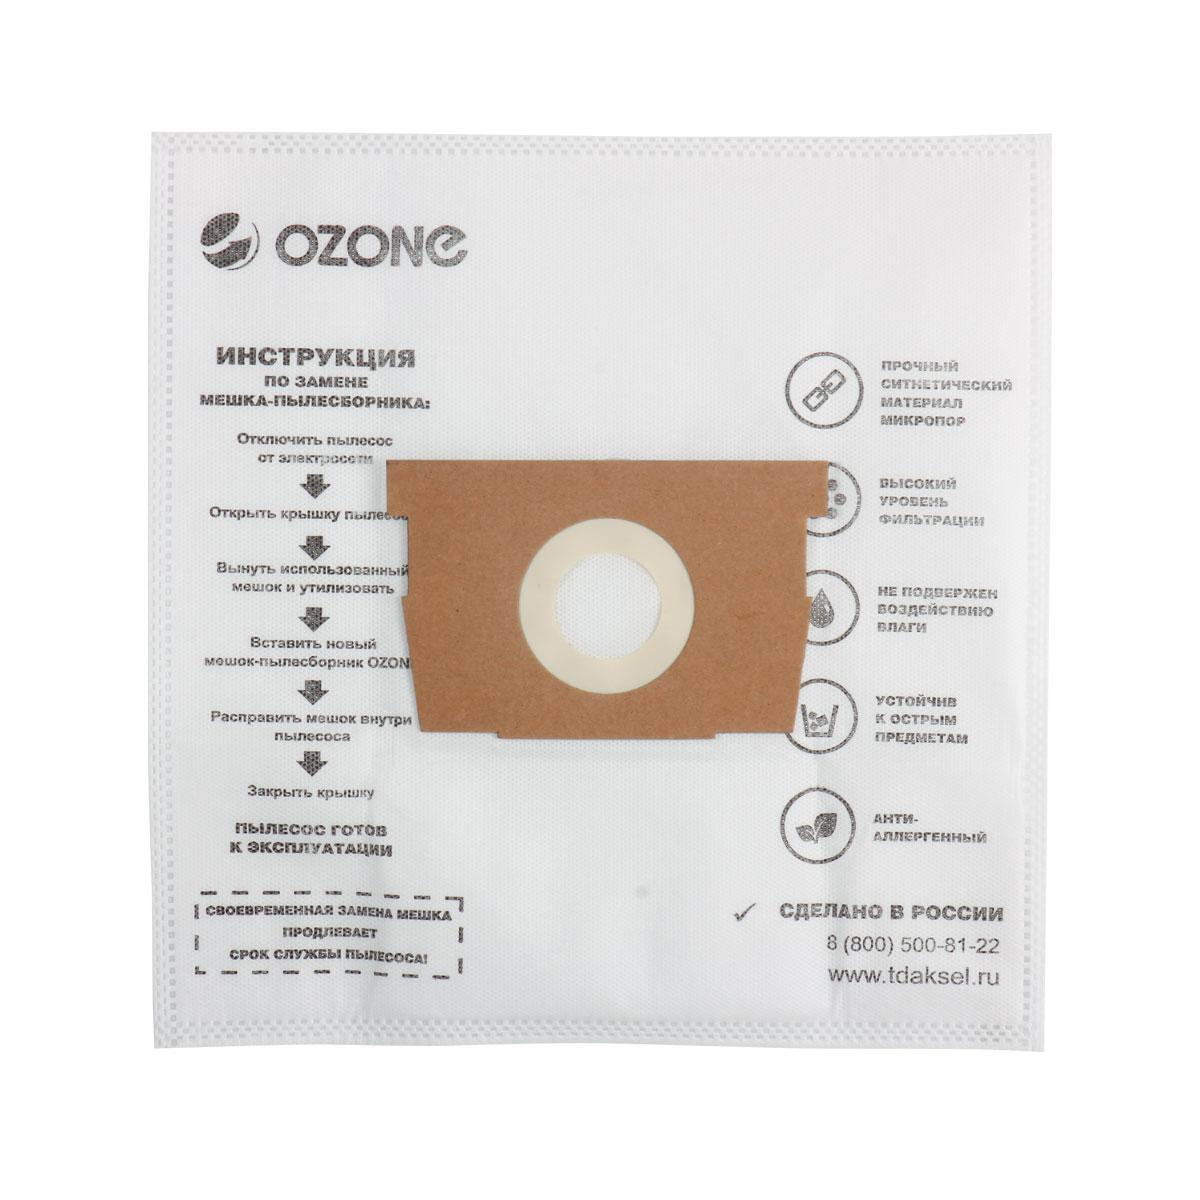 Пылесборник OZONE M-31 цены